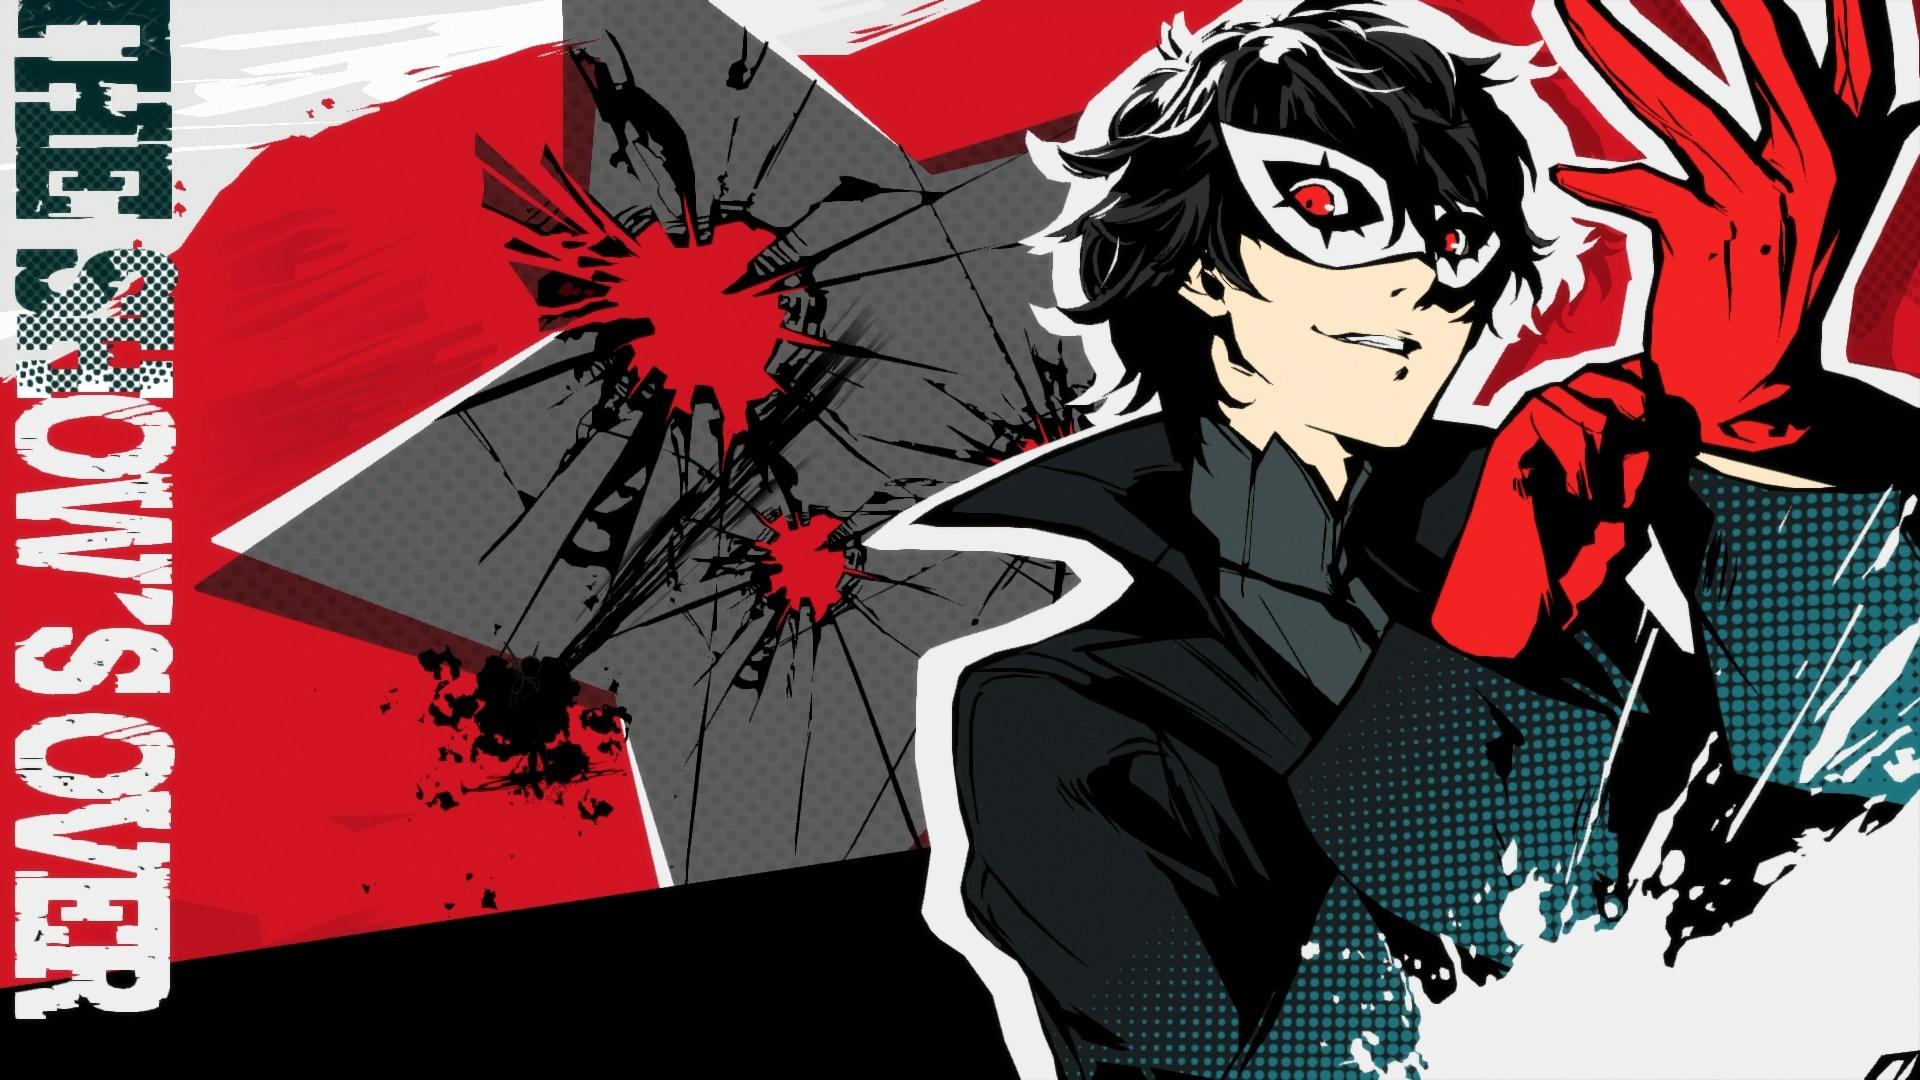 RPG Persona 5 через неделю после релиза возглавила британский чарт